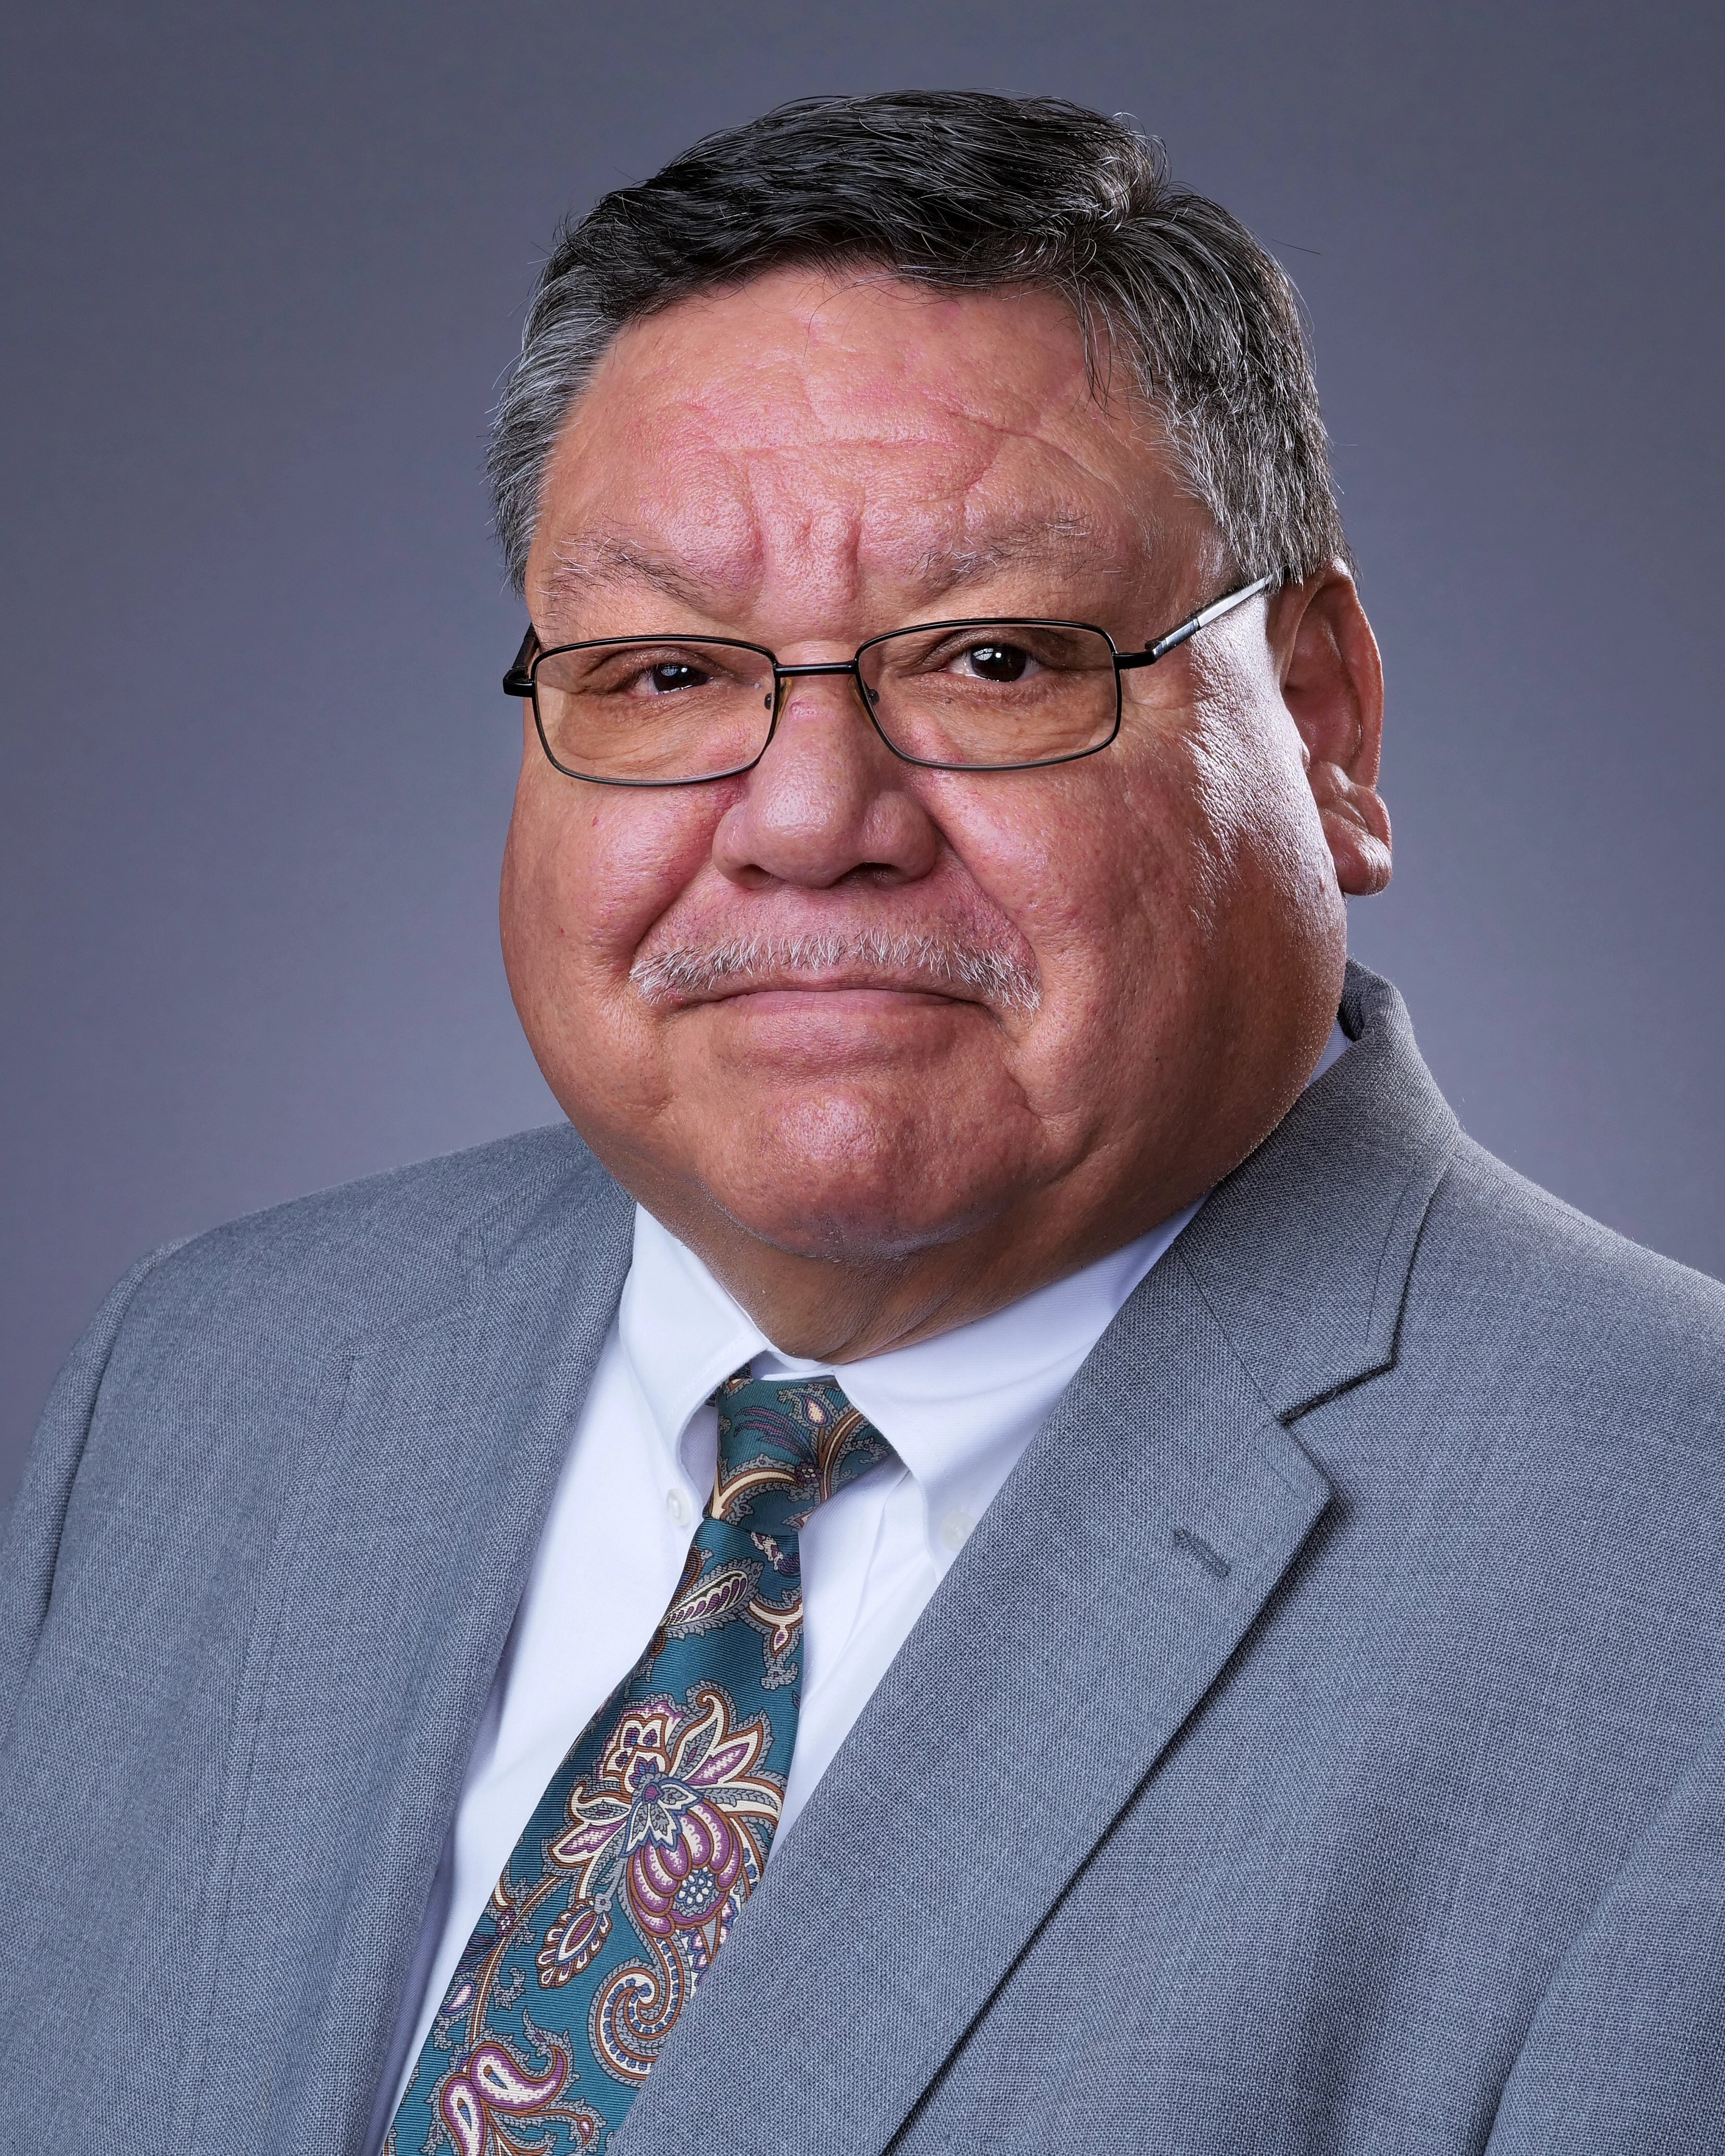 Orlando Perez, Warden